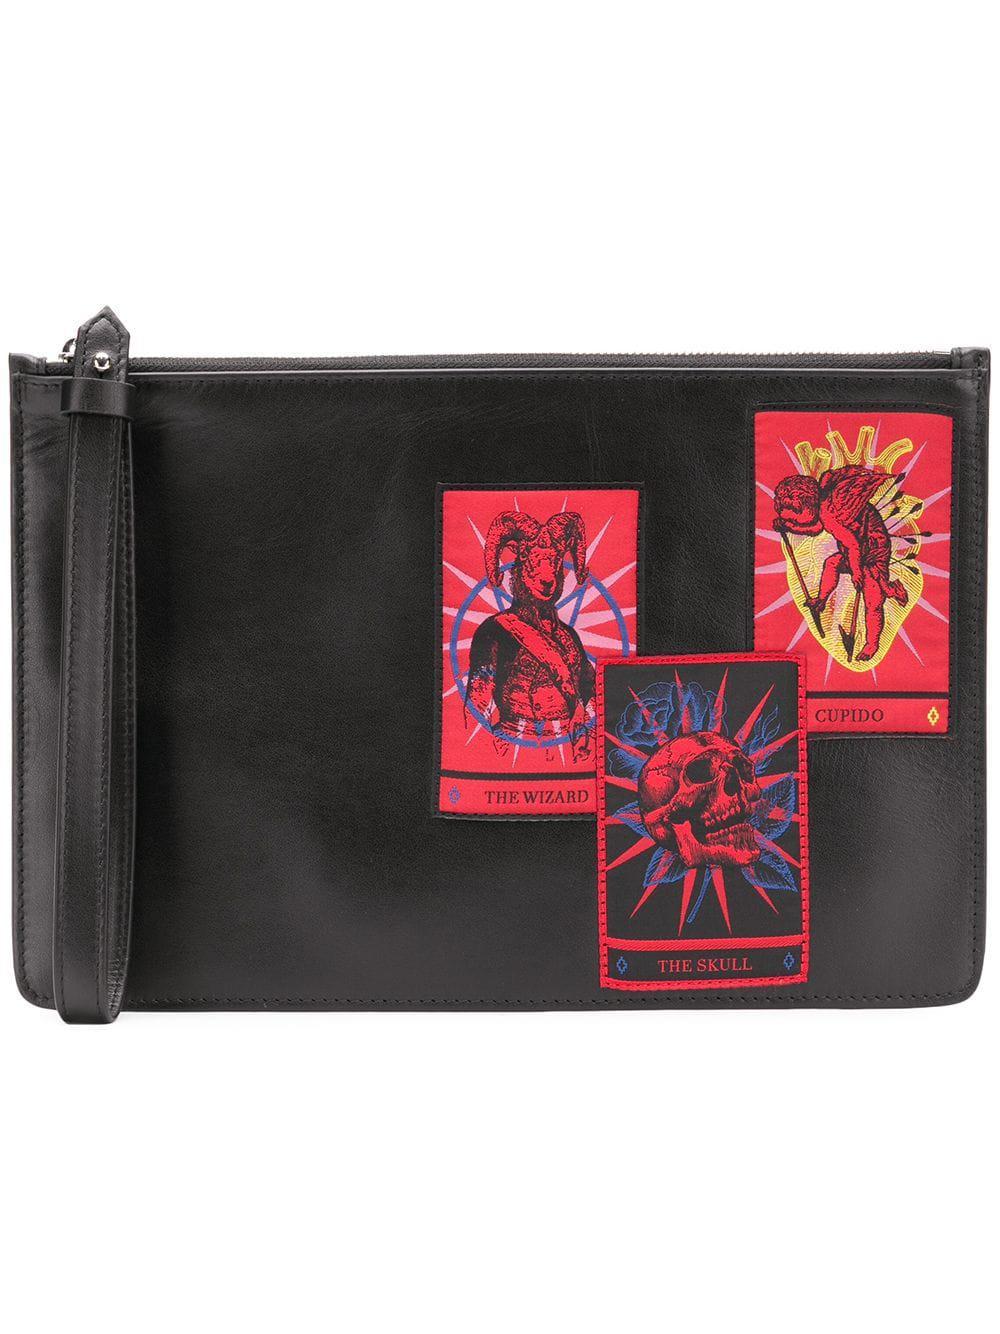 Marcelo Burlon County Of Milan Tarot Clutch Bag In Black